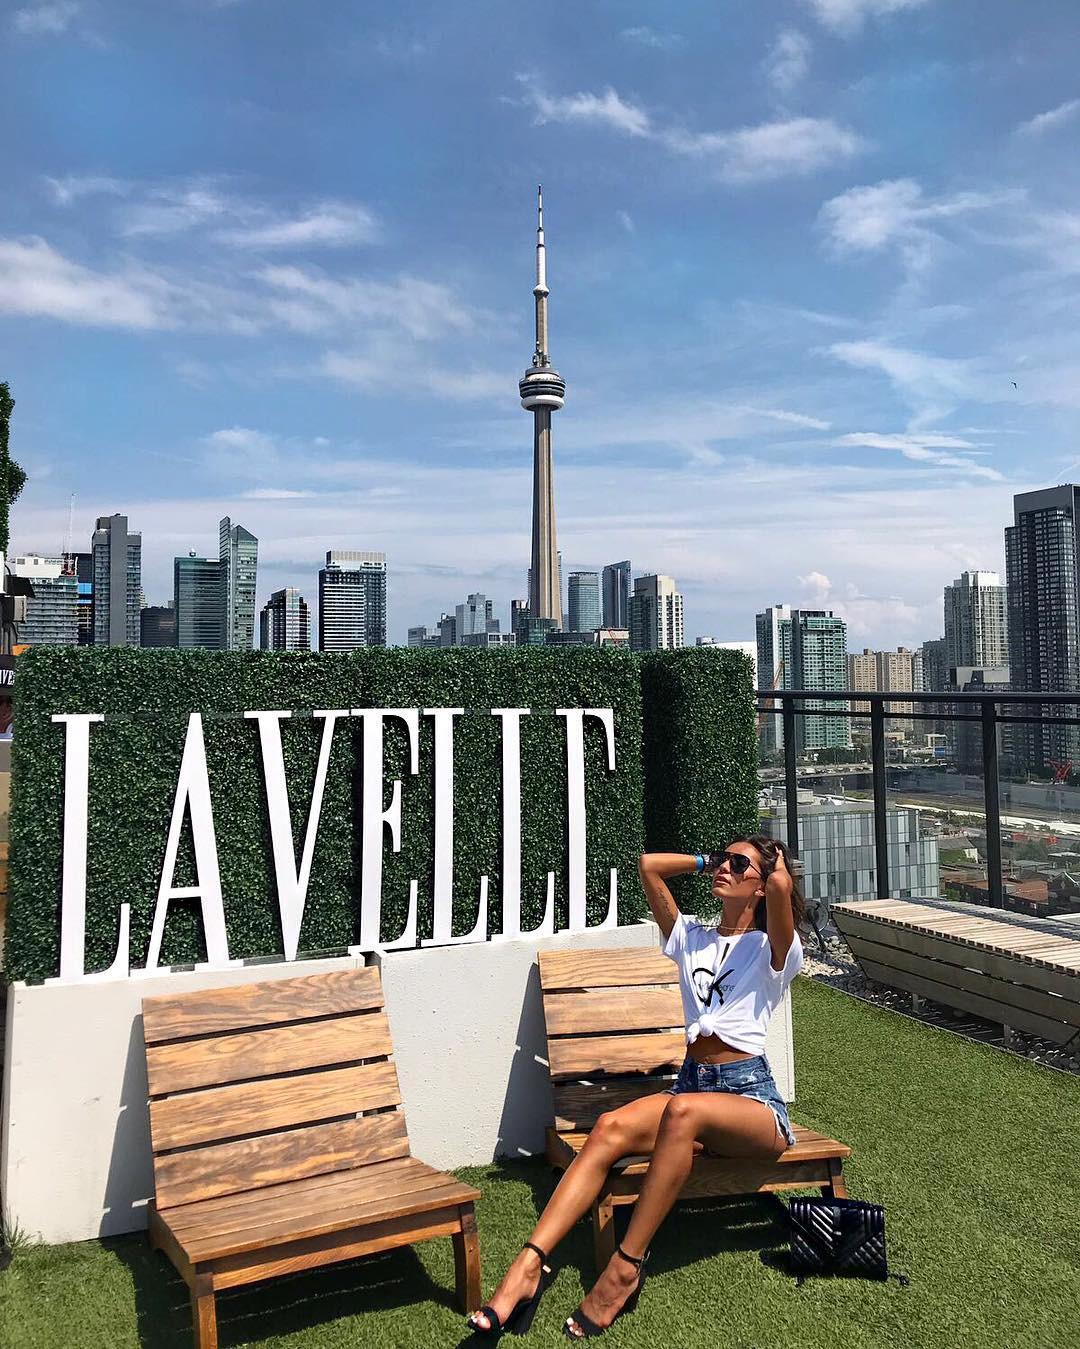 Lavelle, Toronto, Ontario, Canada. instagram.com/simoesxox